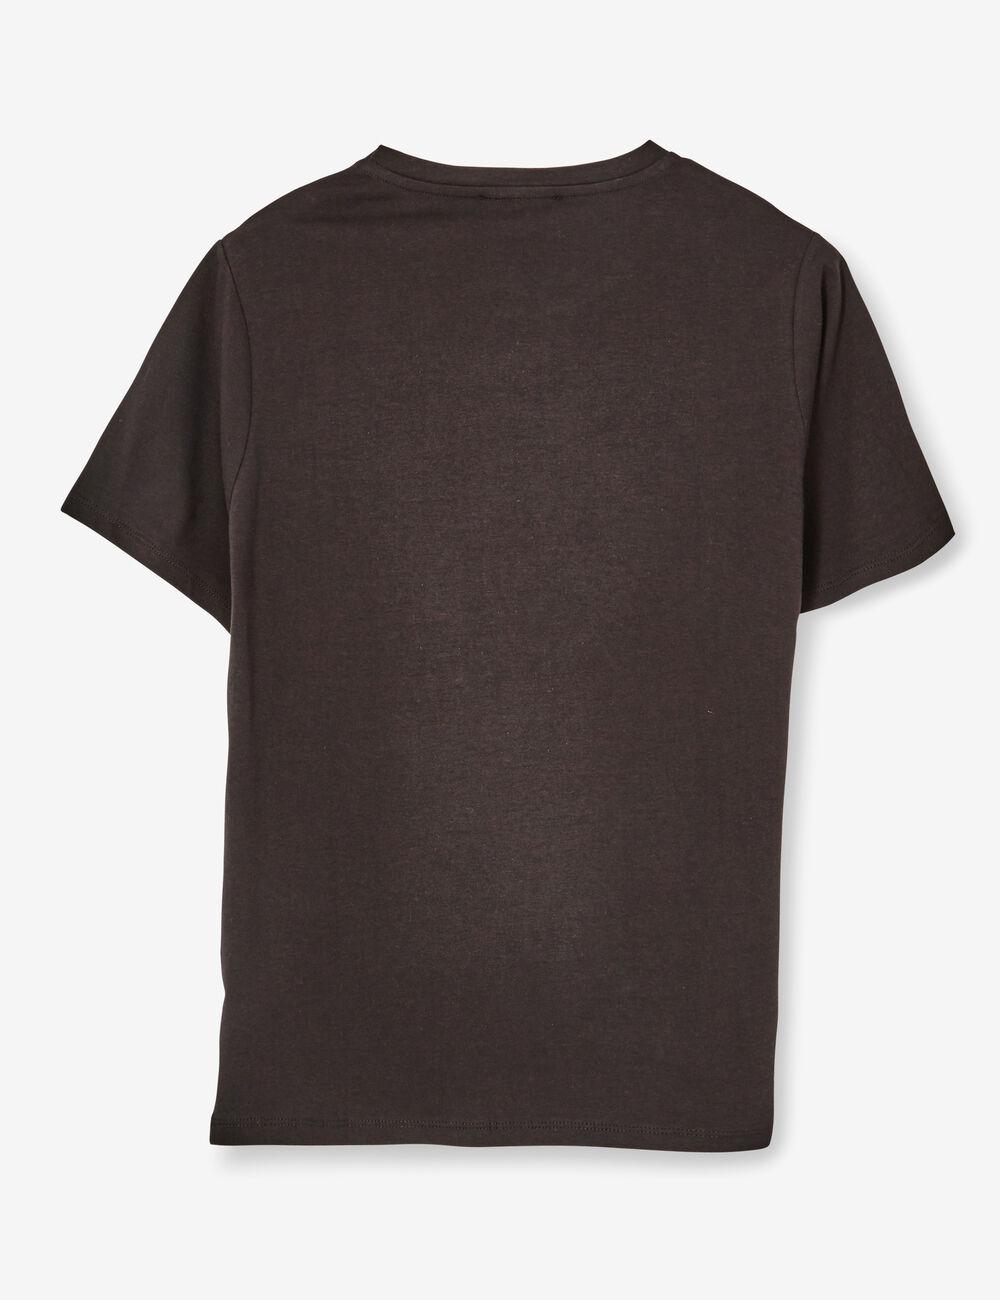 tee shirt avec perles noir femme jennyfer. Black Bedroom Furniture Sets. Home Design Ideas